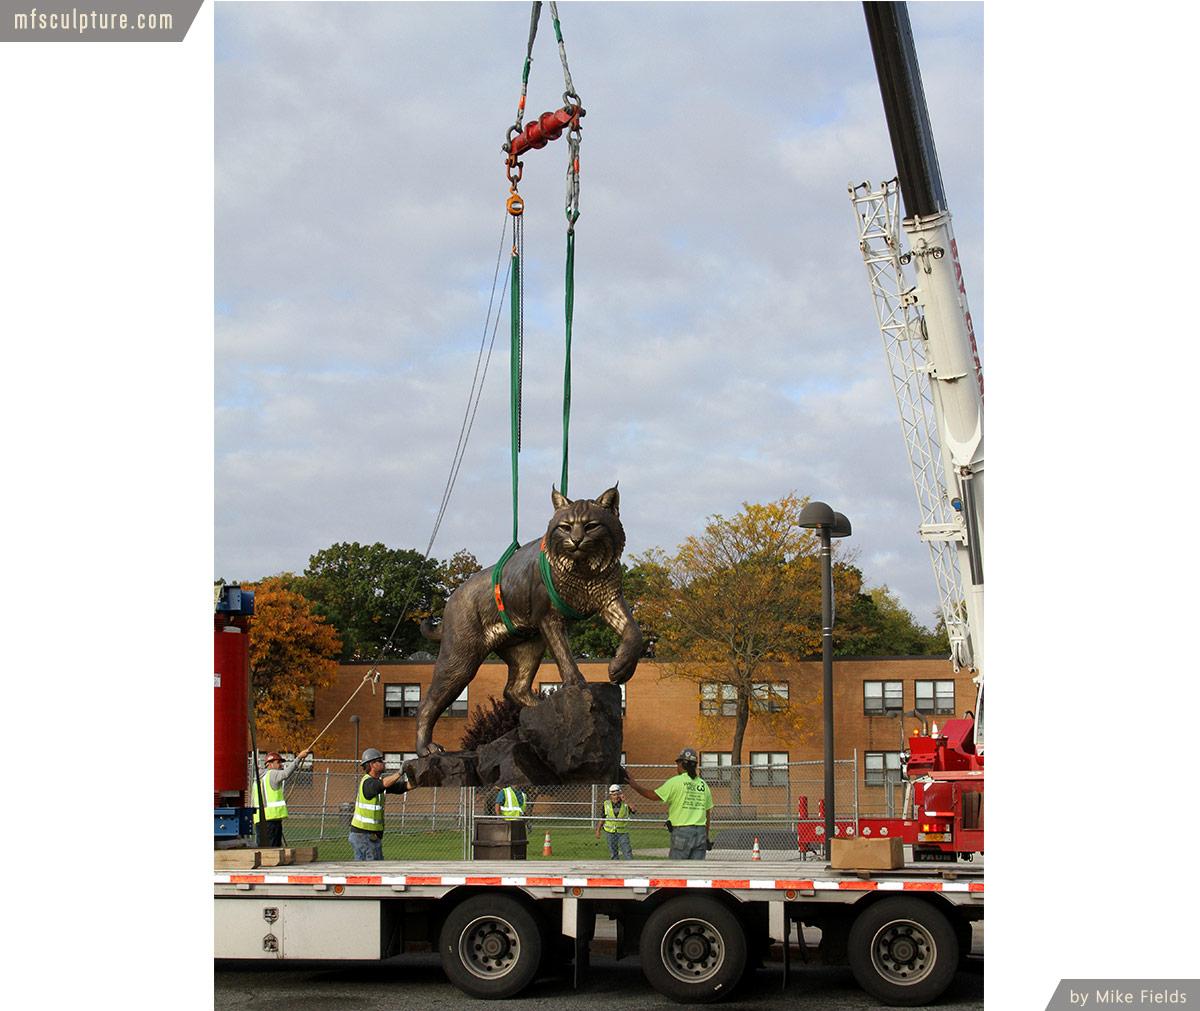 Wildcat Sculpture University Mascot Monument Public Art 5